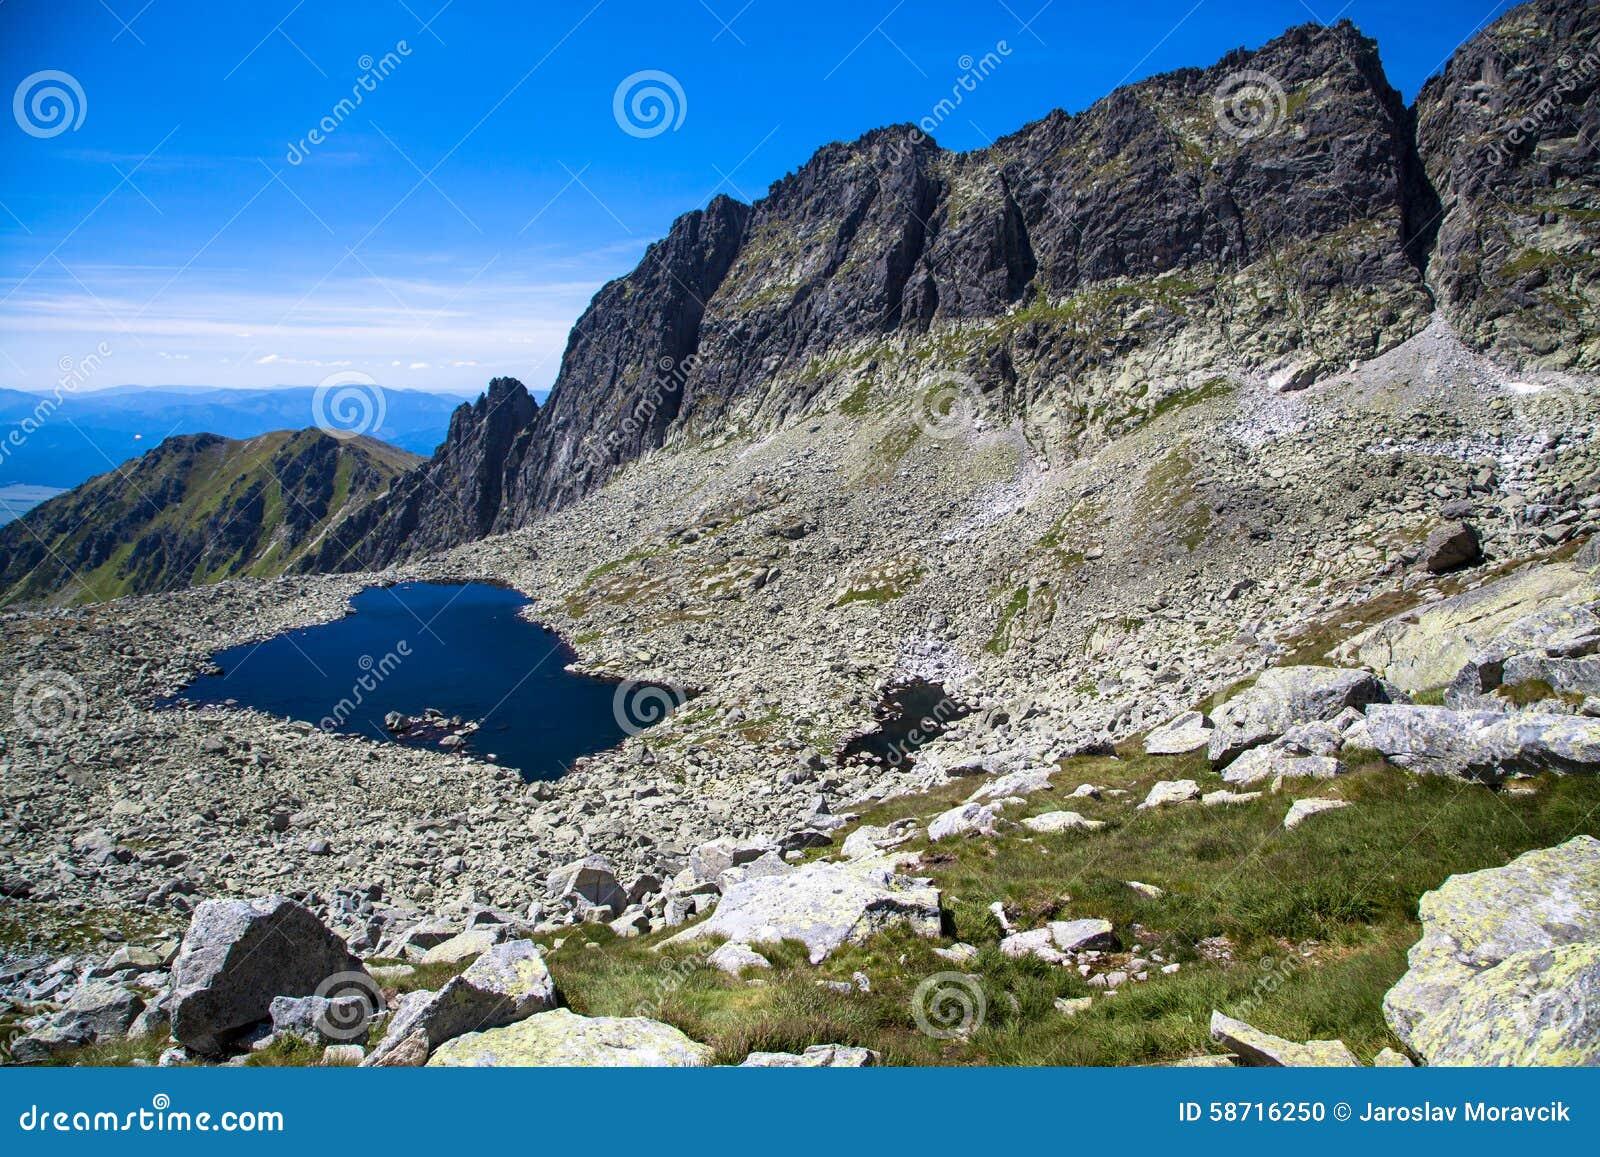 Tarn i berg